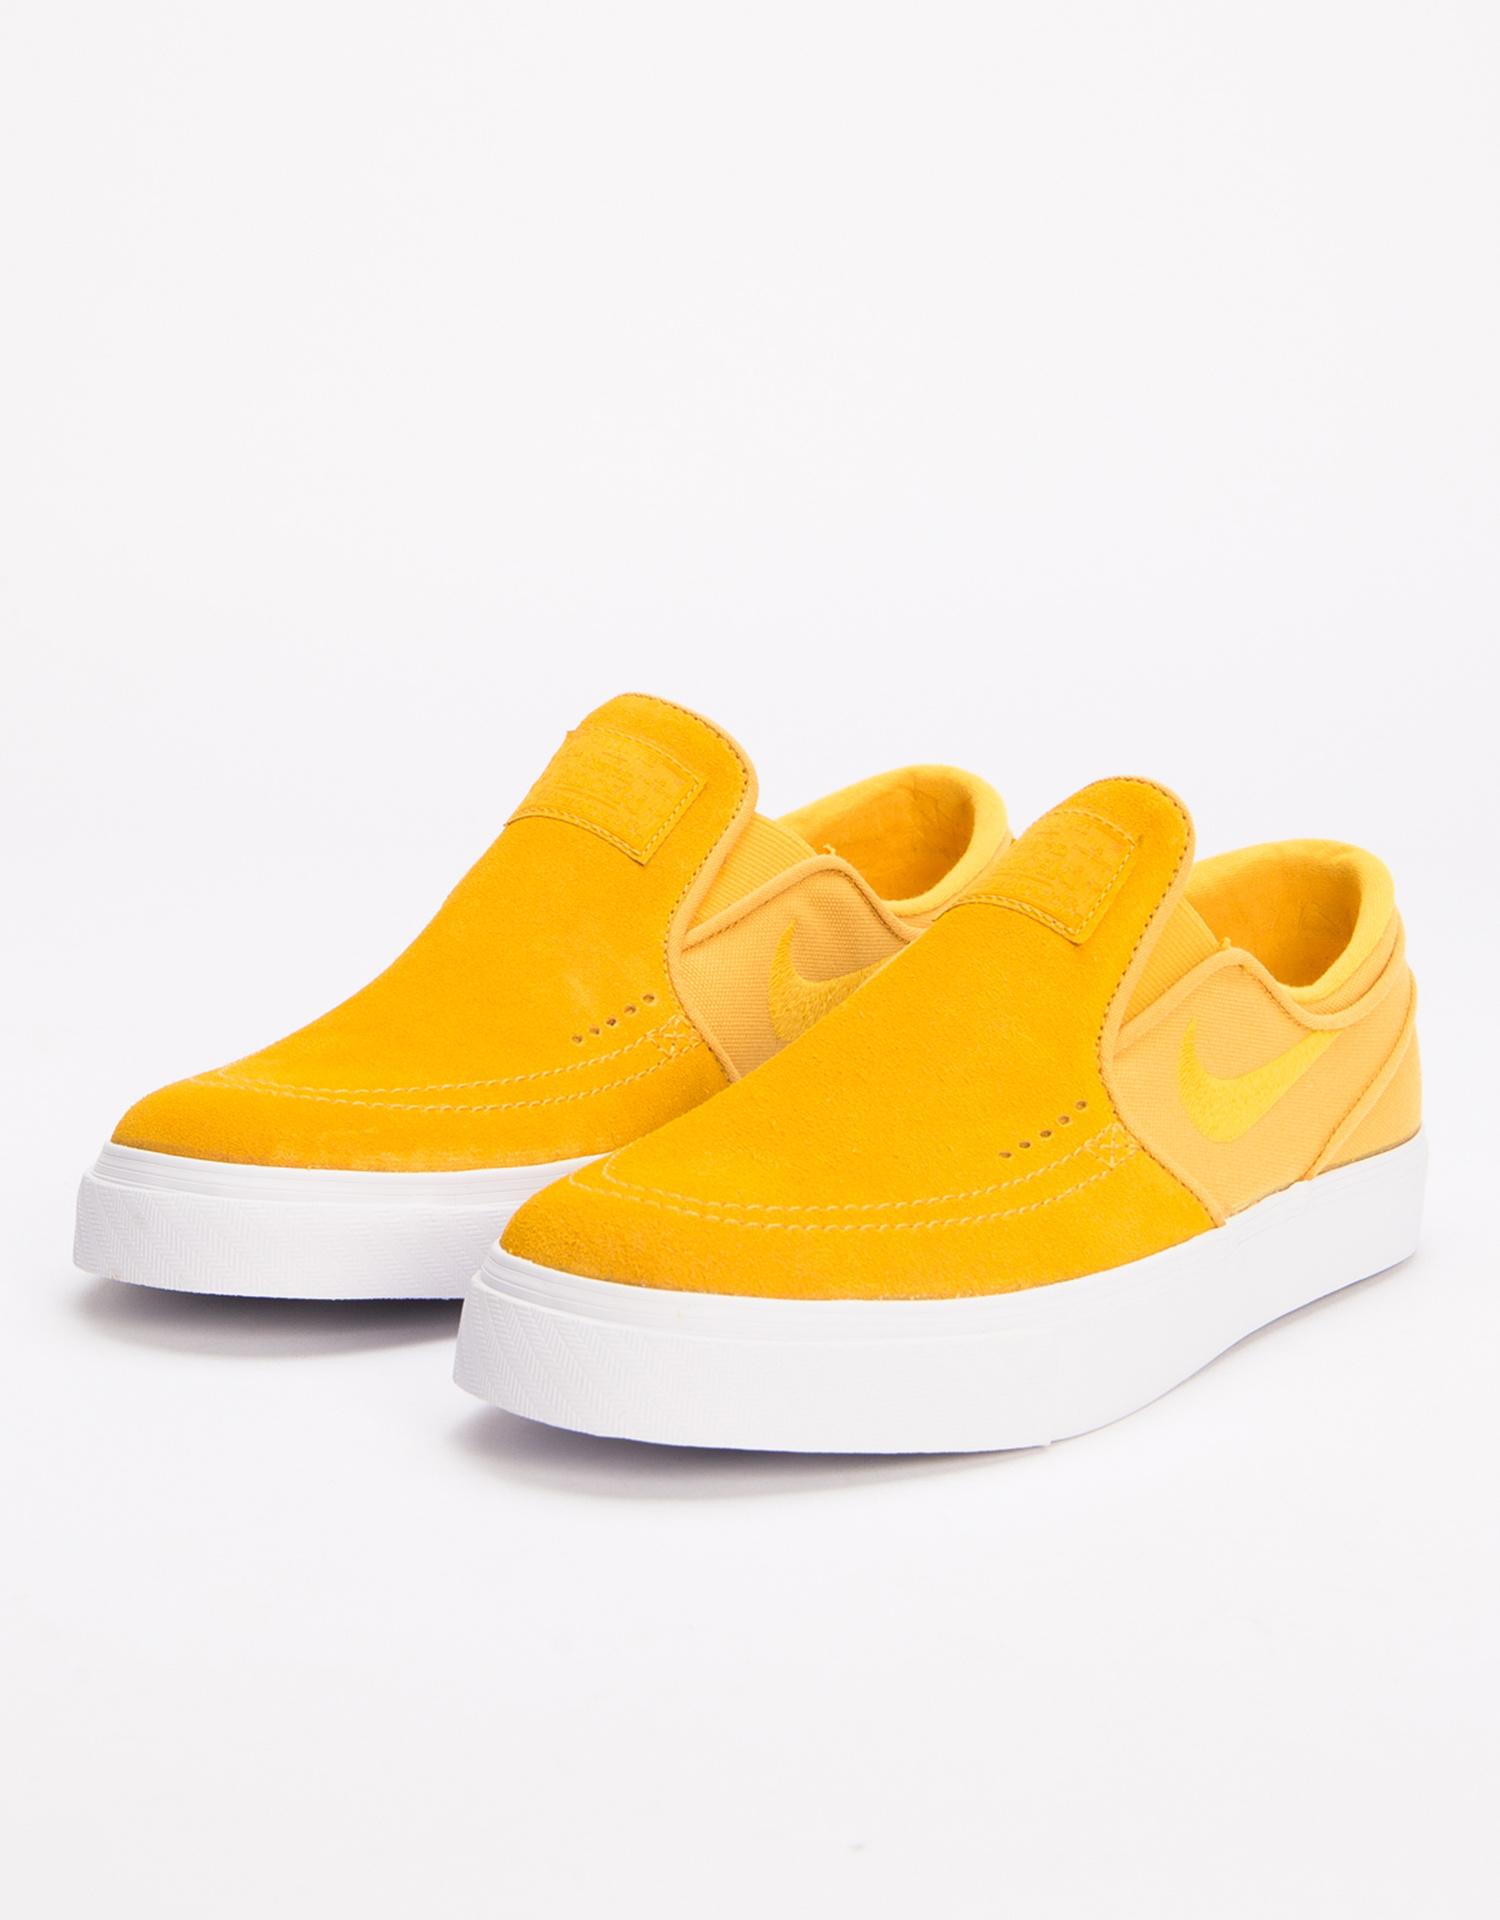 e24937e0faf42 Nike Sb Zoom Stefan Janoski Slip Yellow Ochre Yellow Ochre-White - Lockwood  Skateshop